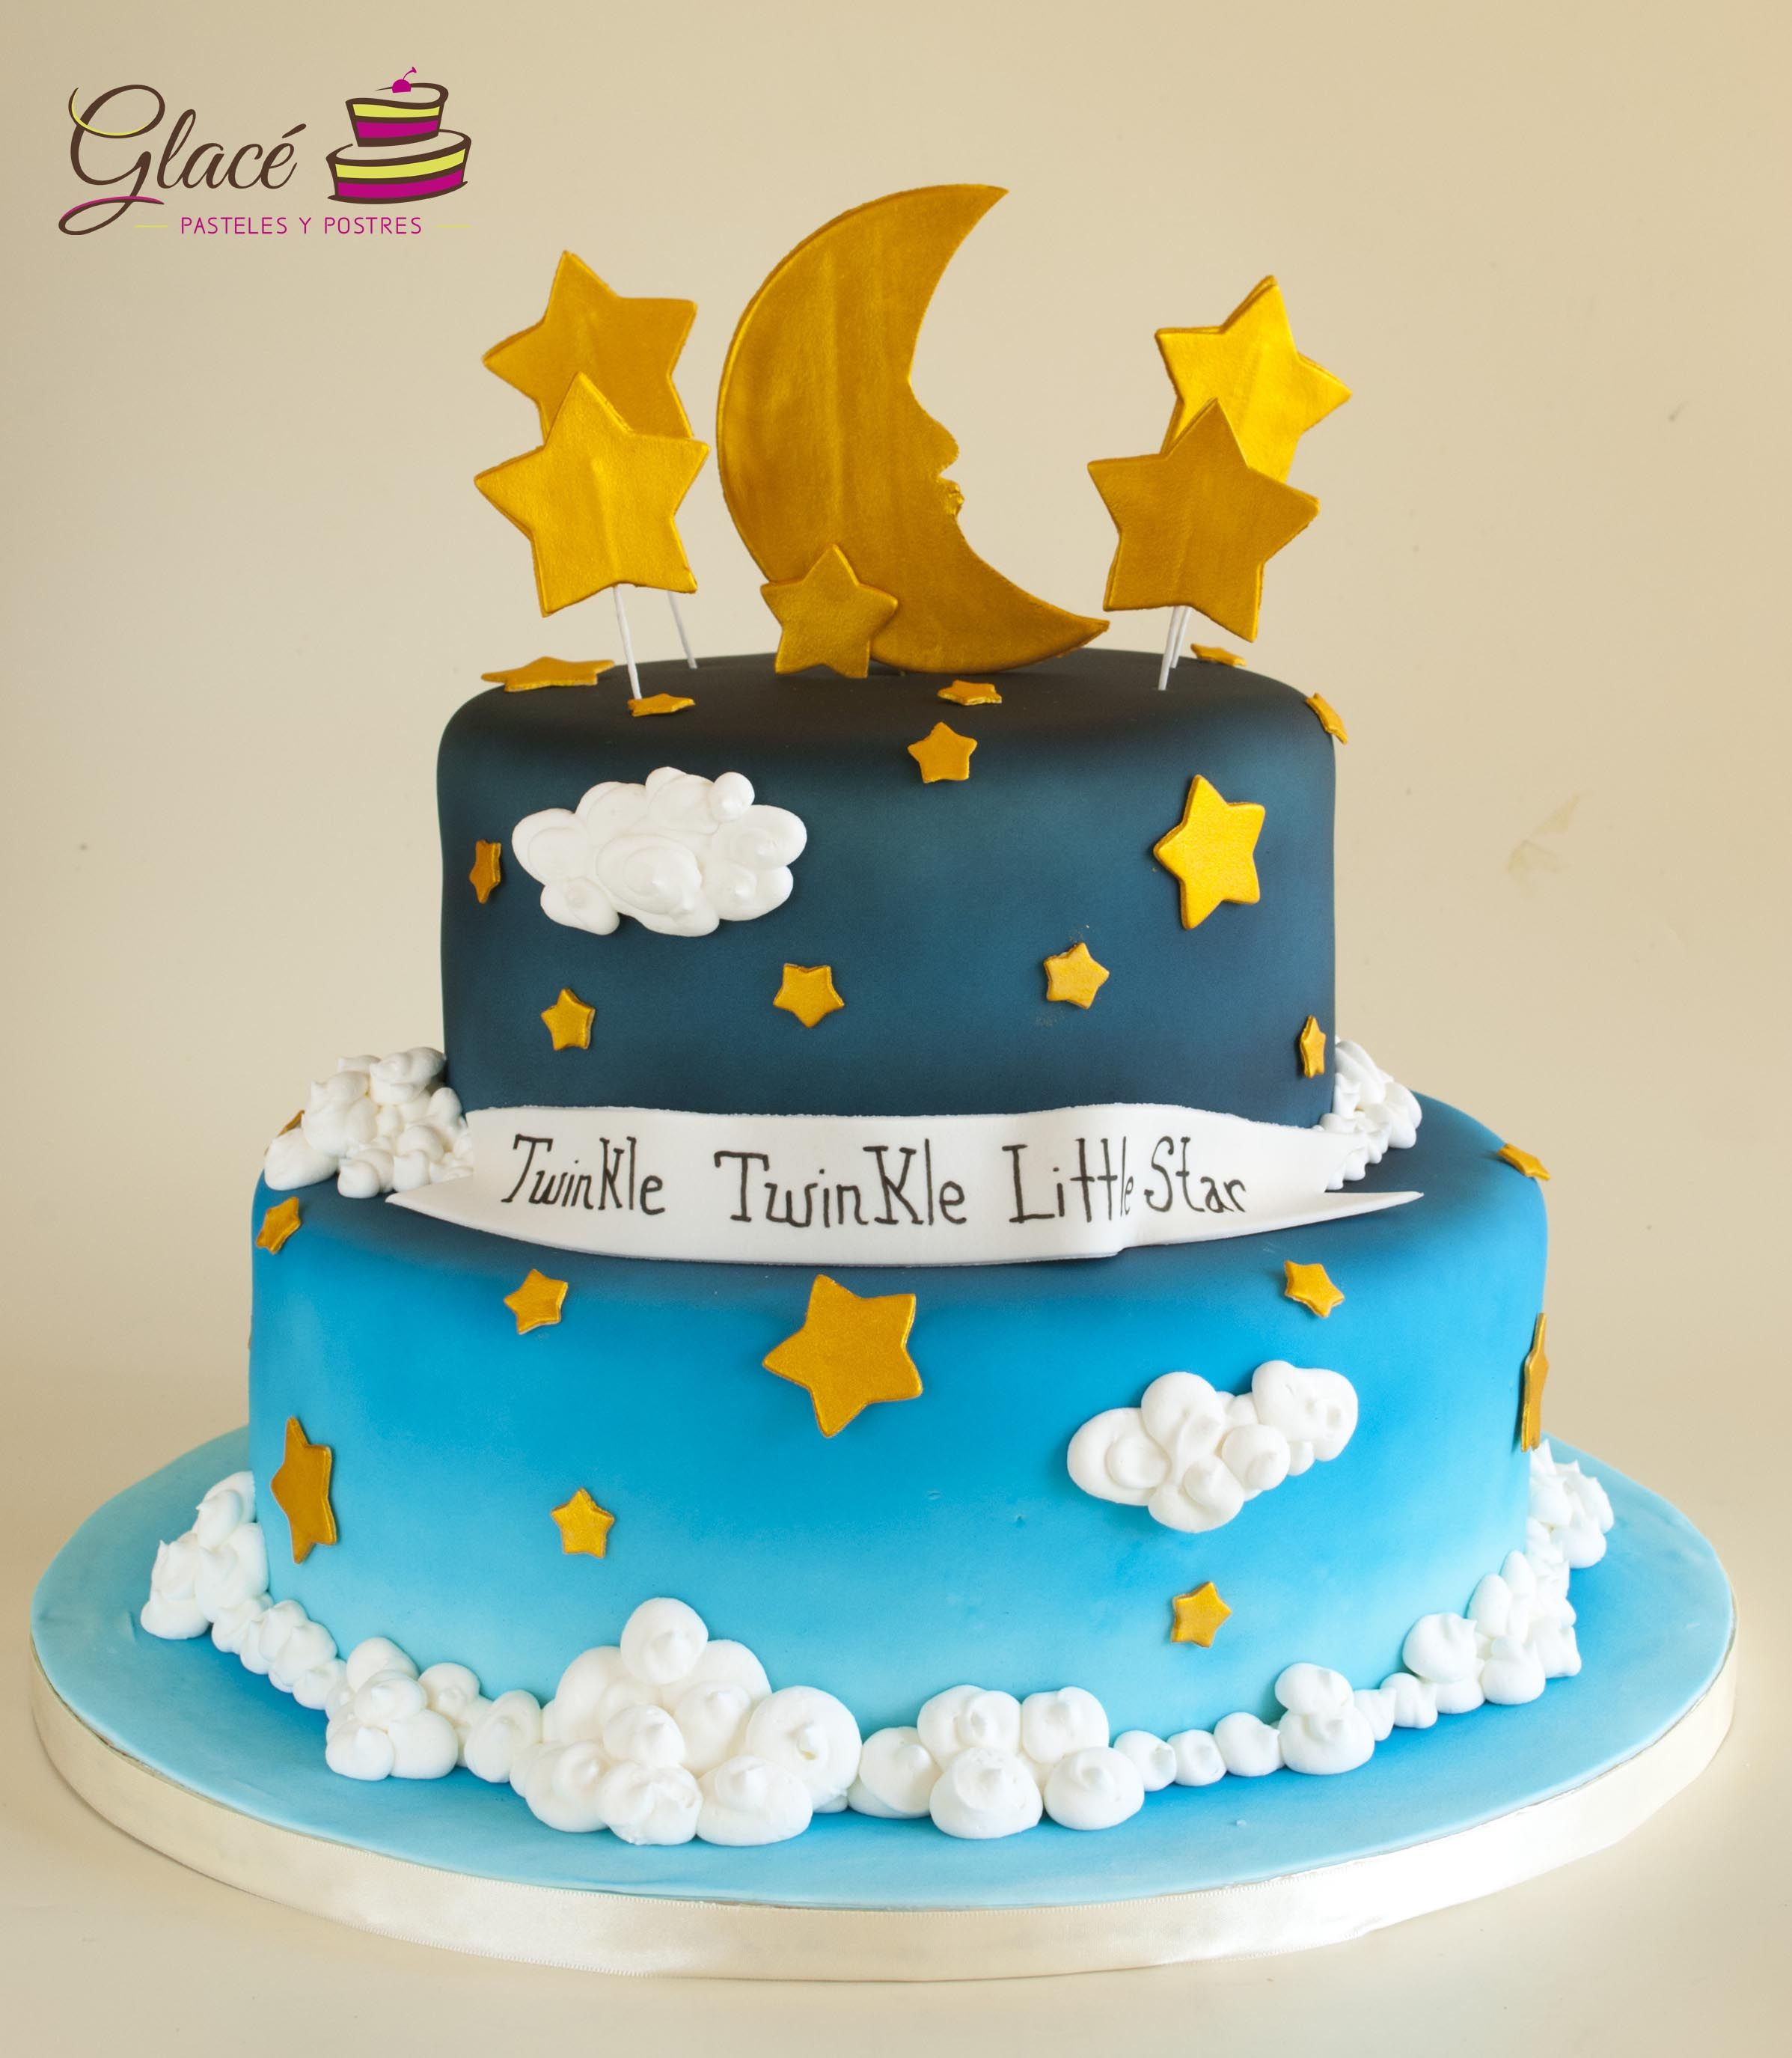 Twinkle twinkle little star Decorado con fondant y decoraciones de azúcar.